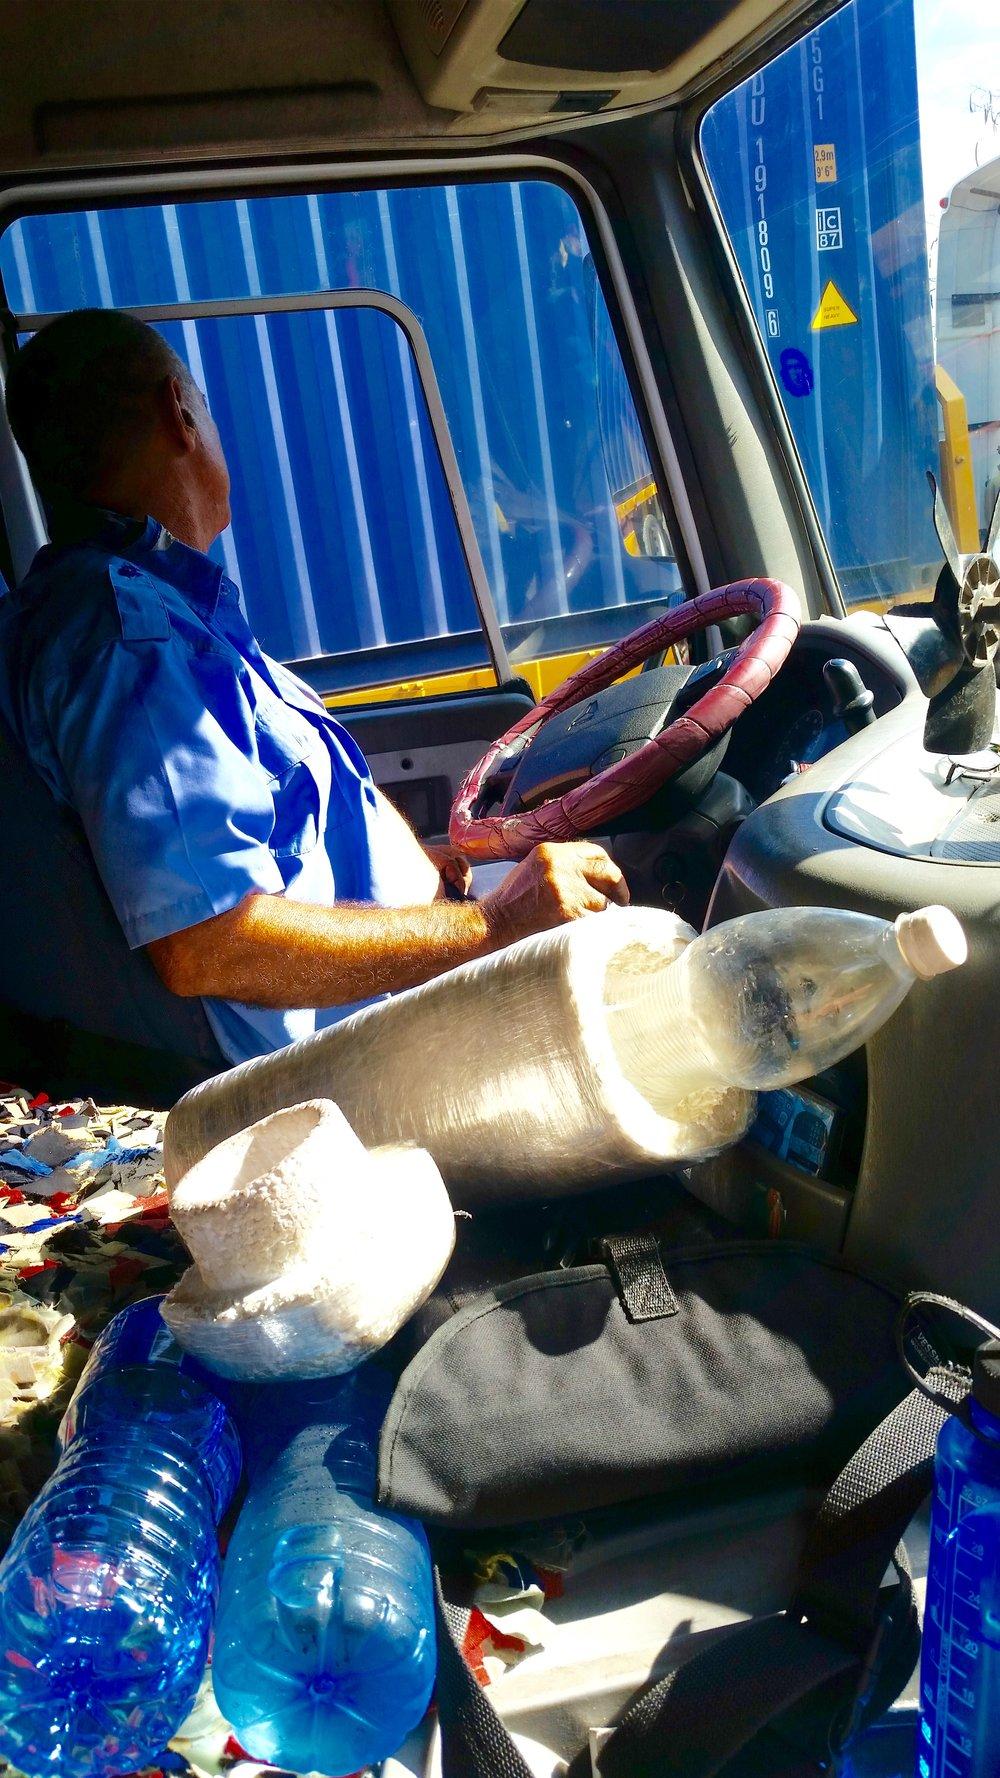 A trucker's homemade water bottle cooler keeps him refreshed from Santa Clara to Jaguey Grande, Matanzas